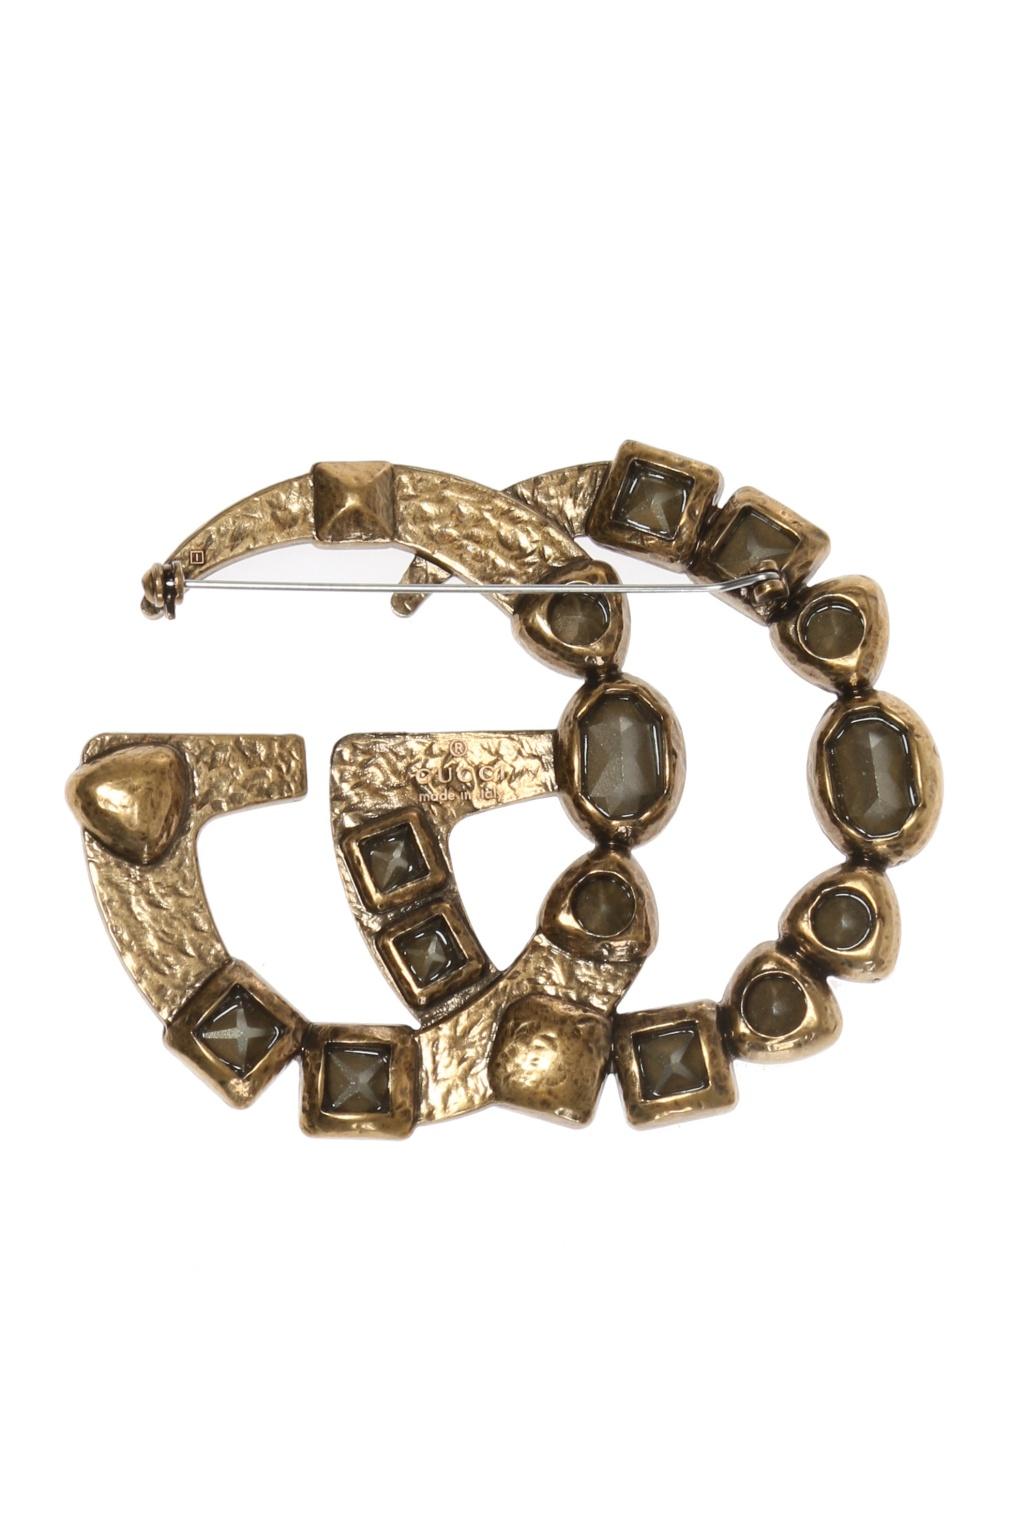 Gucci Logo-shaped brooch